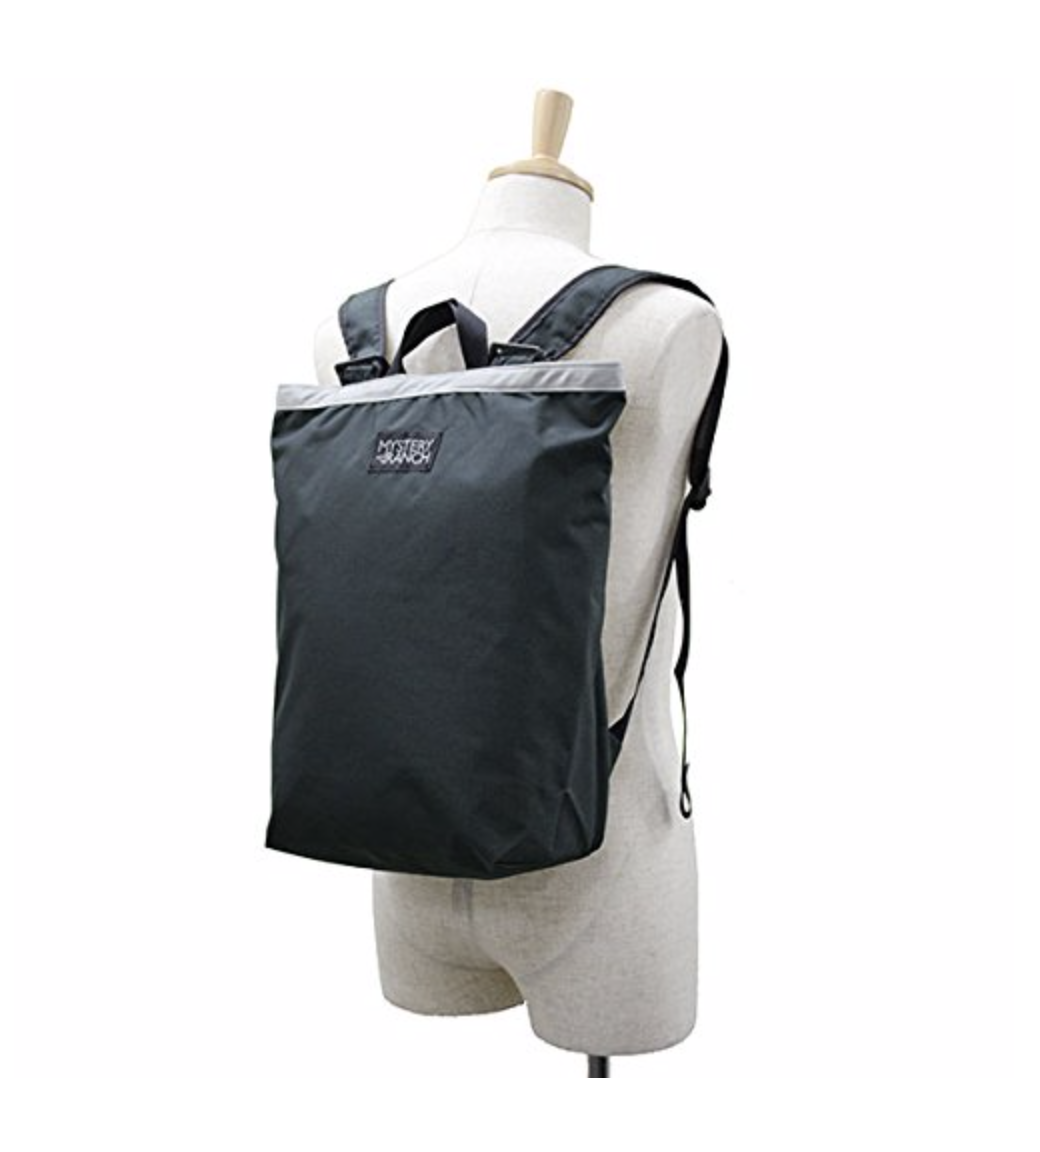 f:id:thebackpack:20190927200229p:plain